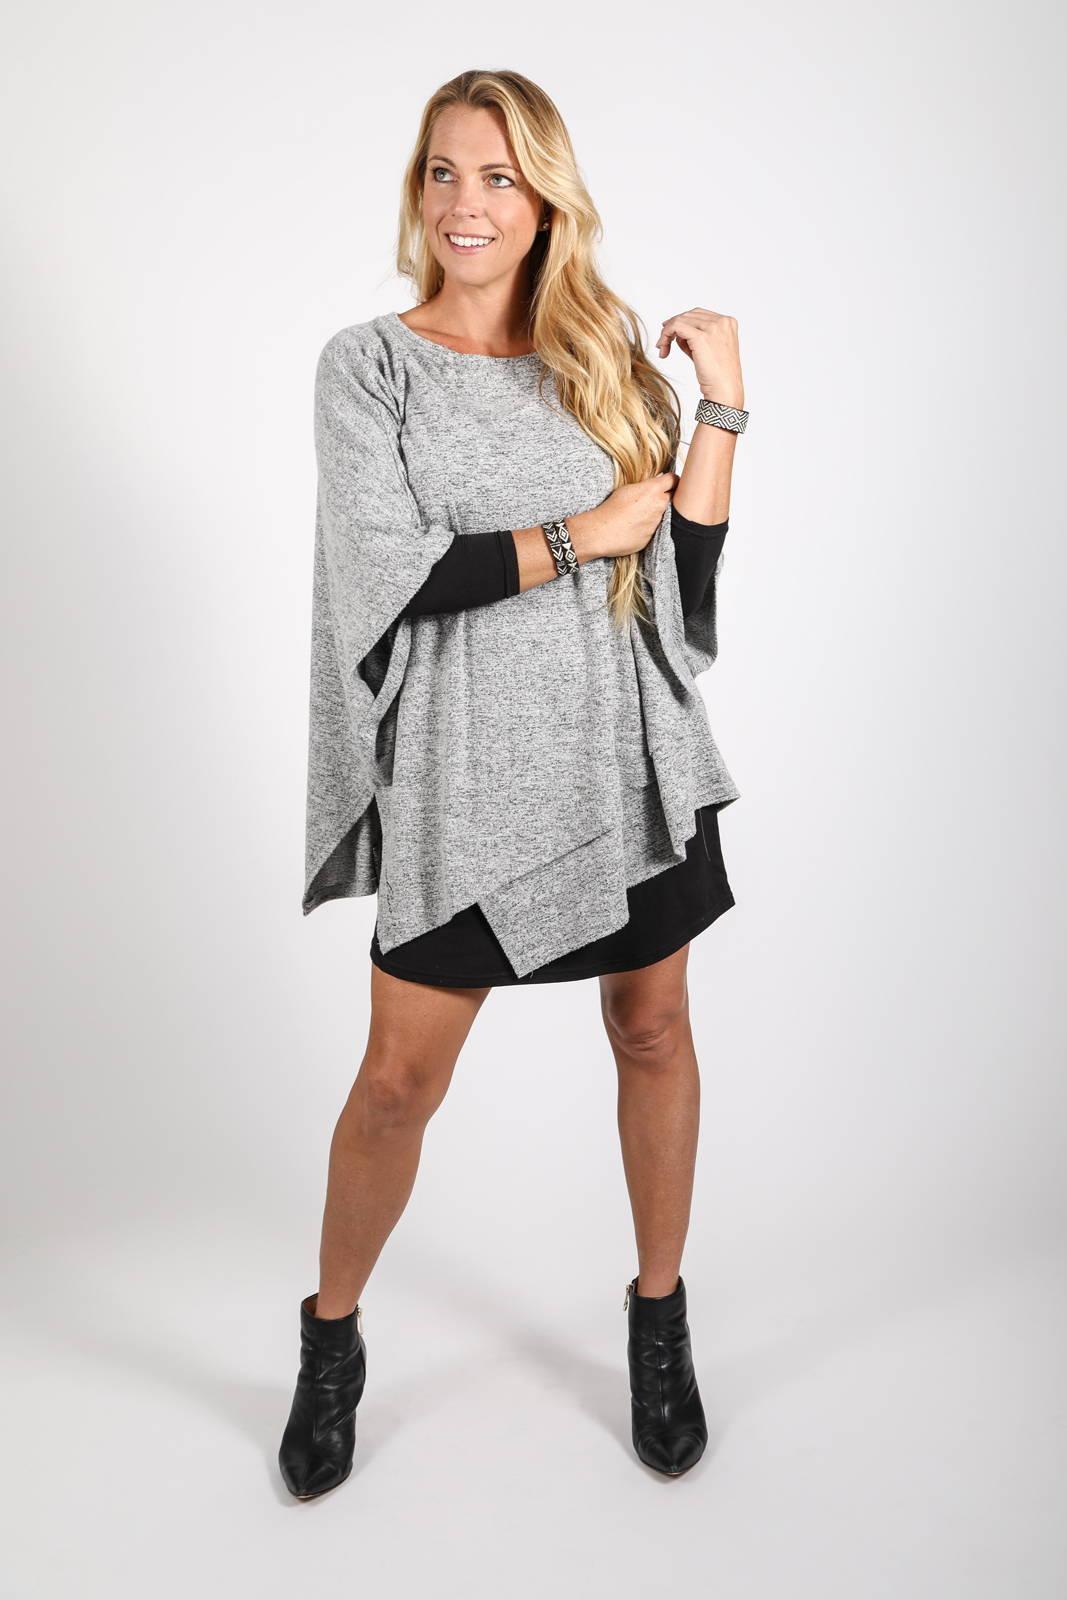 Model wearing the Ligero Wrap over the Ina Long Sleeve Dress by illuminative